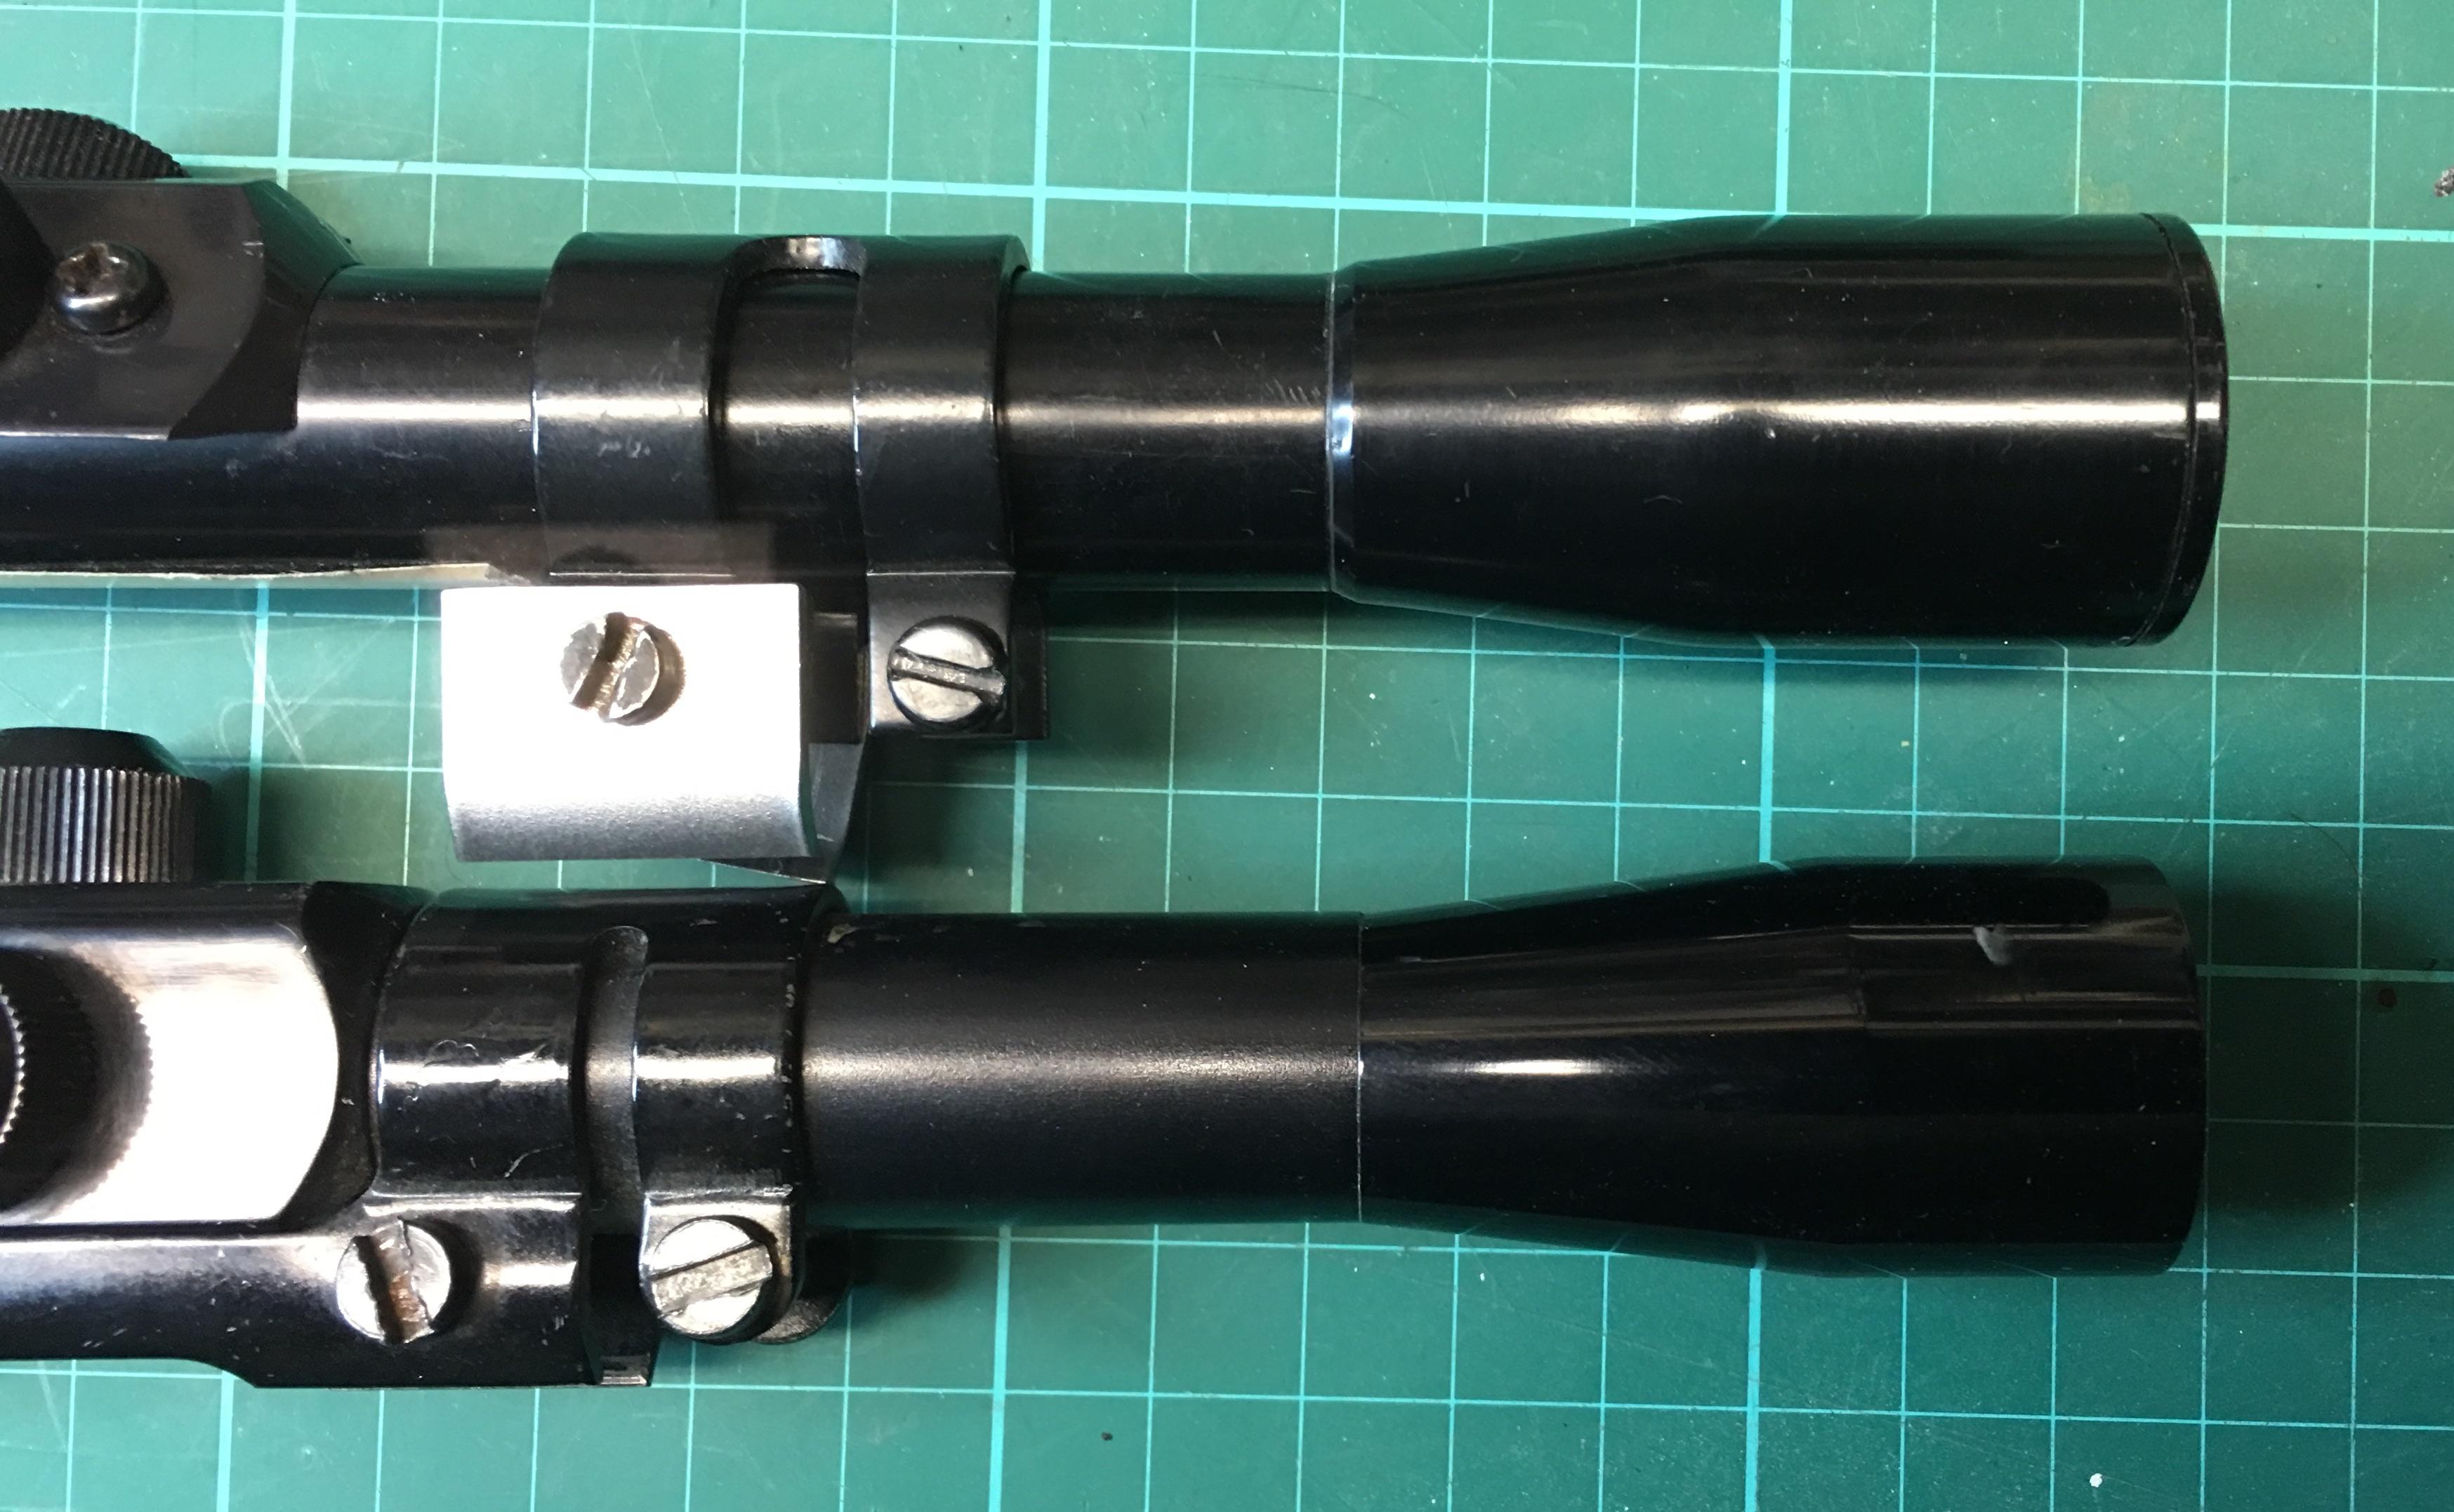 MPG 4x20 scopes 11.JPG